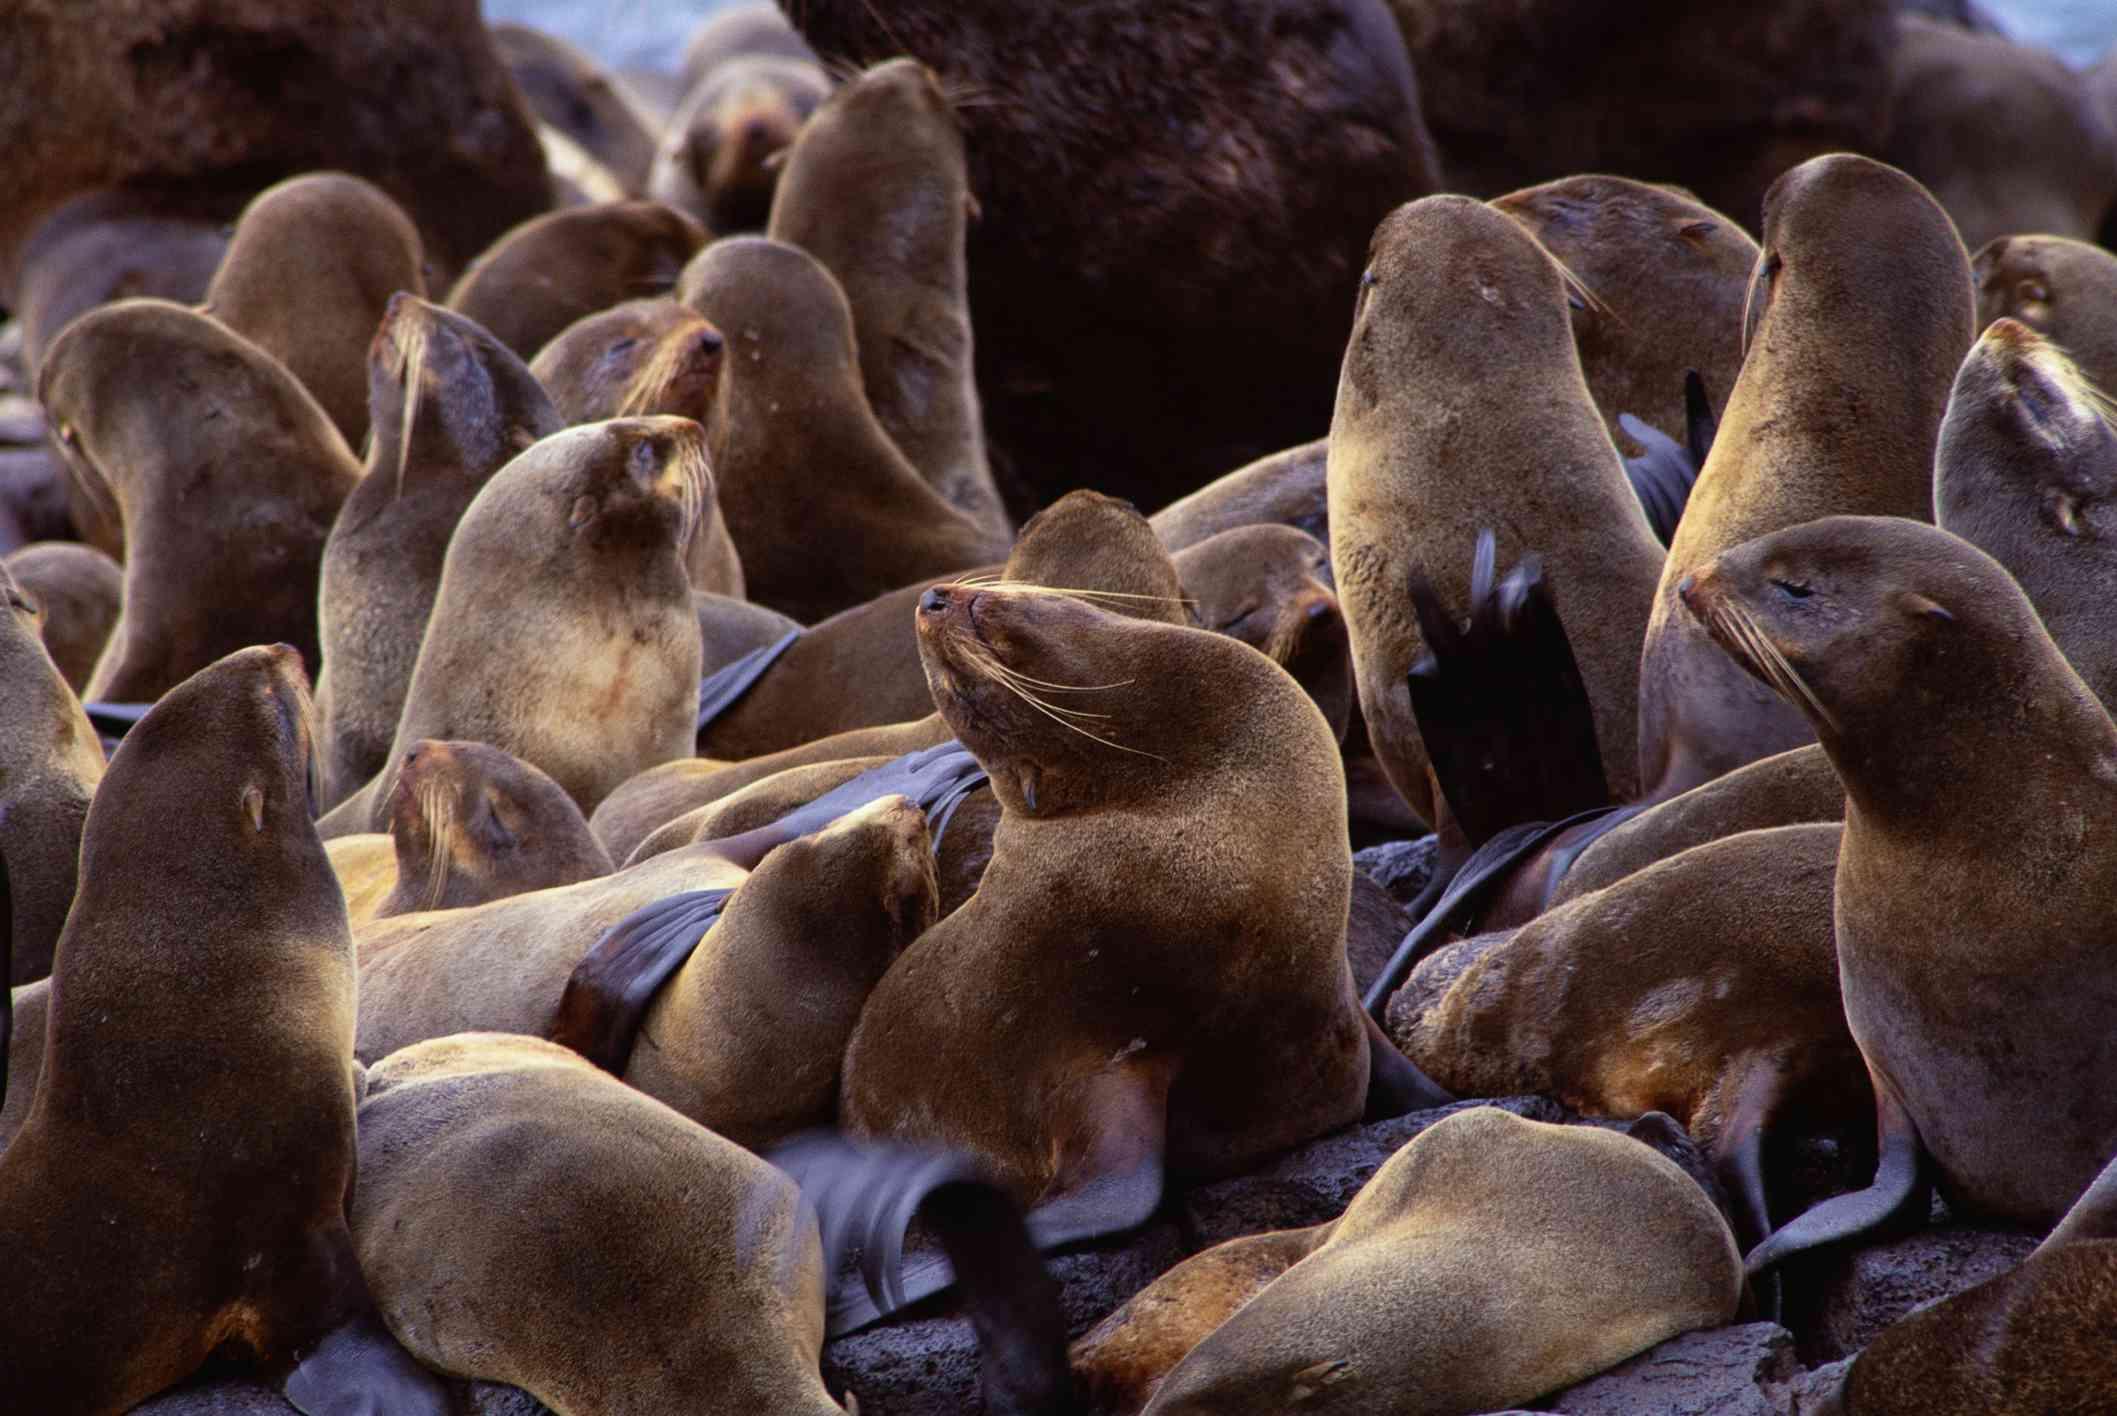 Many fur seals sitting on rocks.